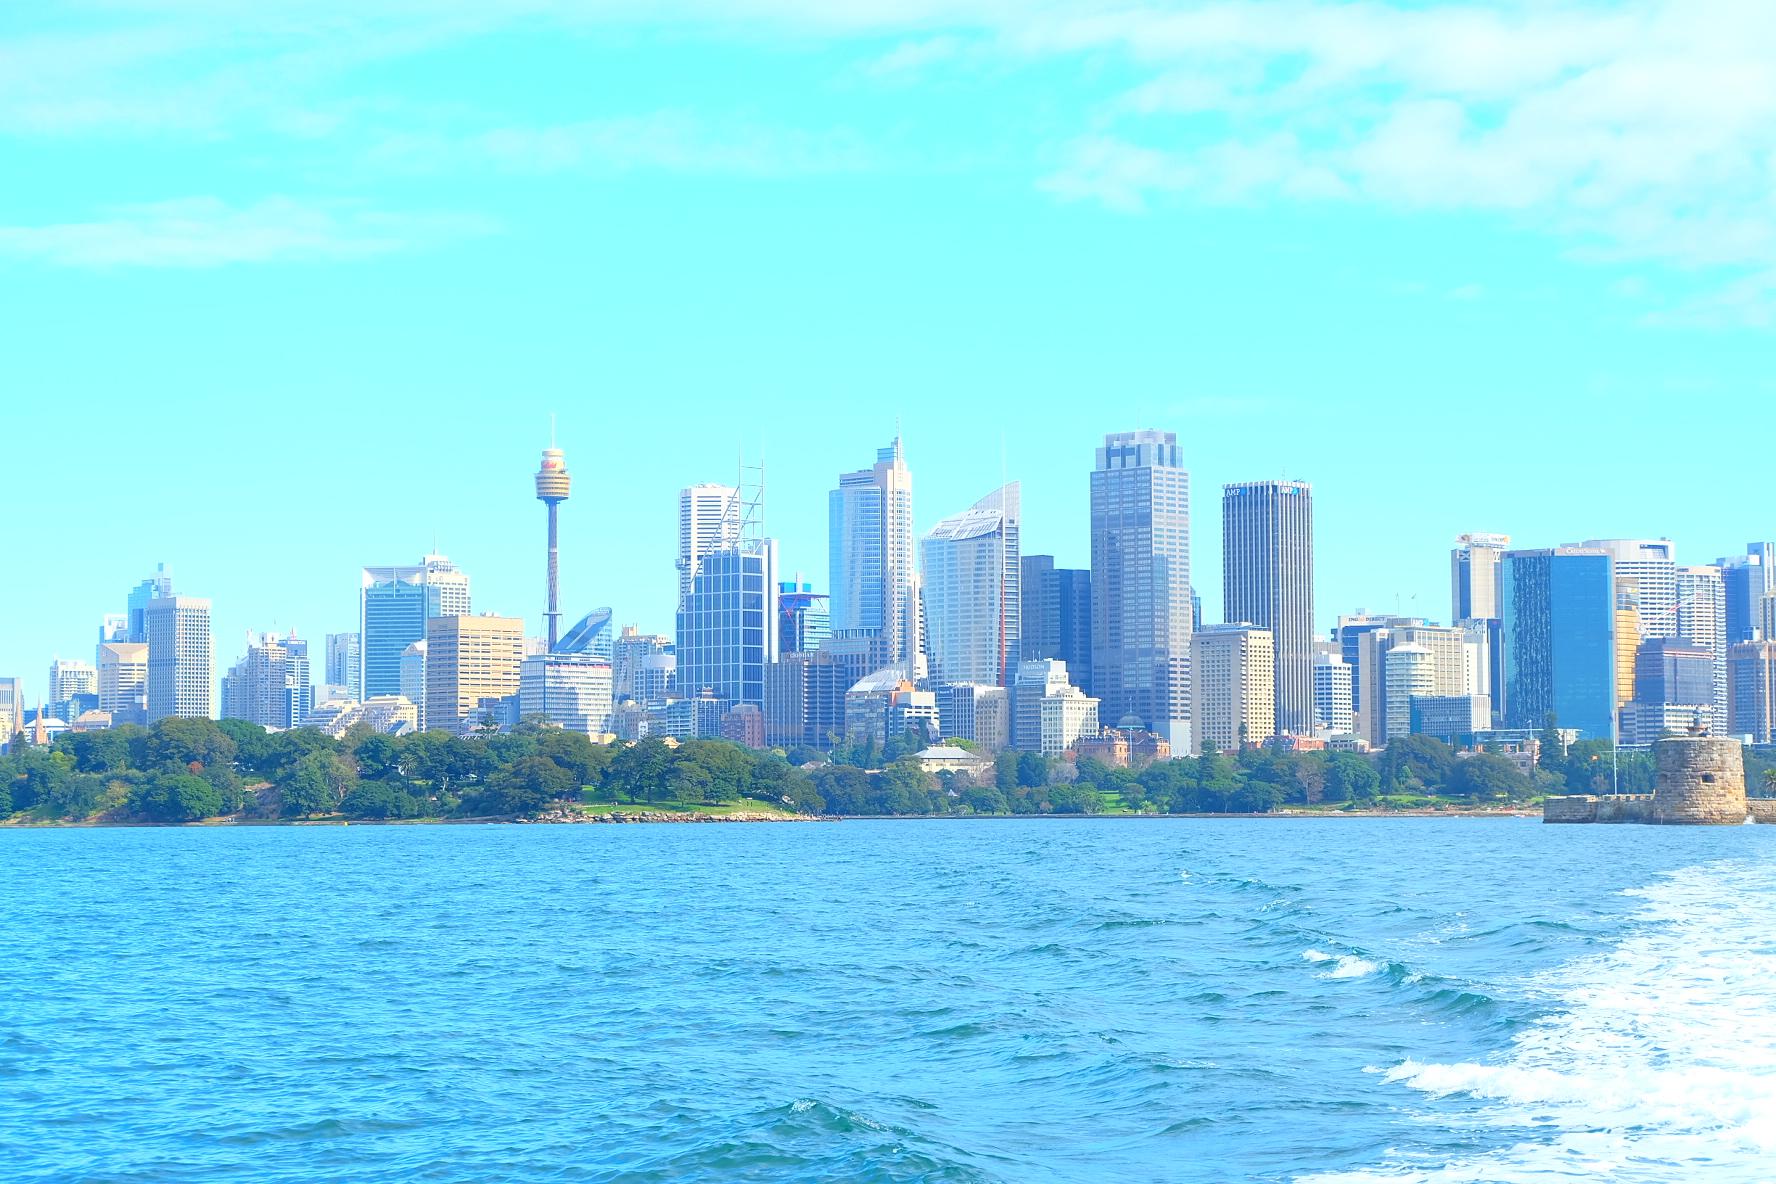 Free stock photo of sea, city, sky, landmark